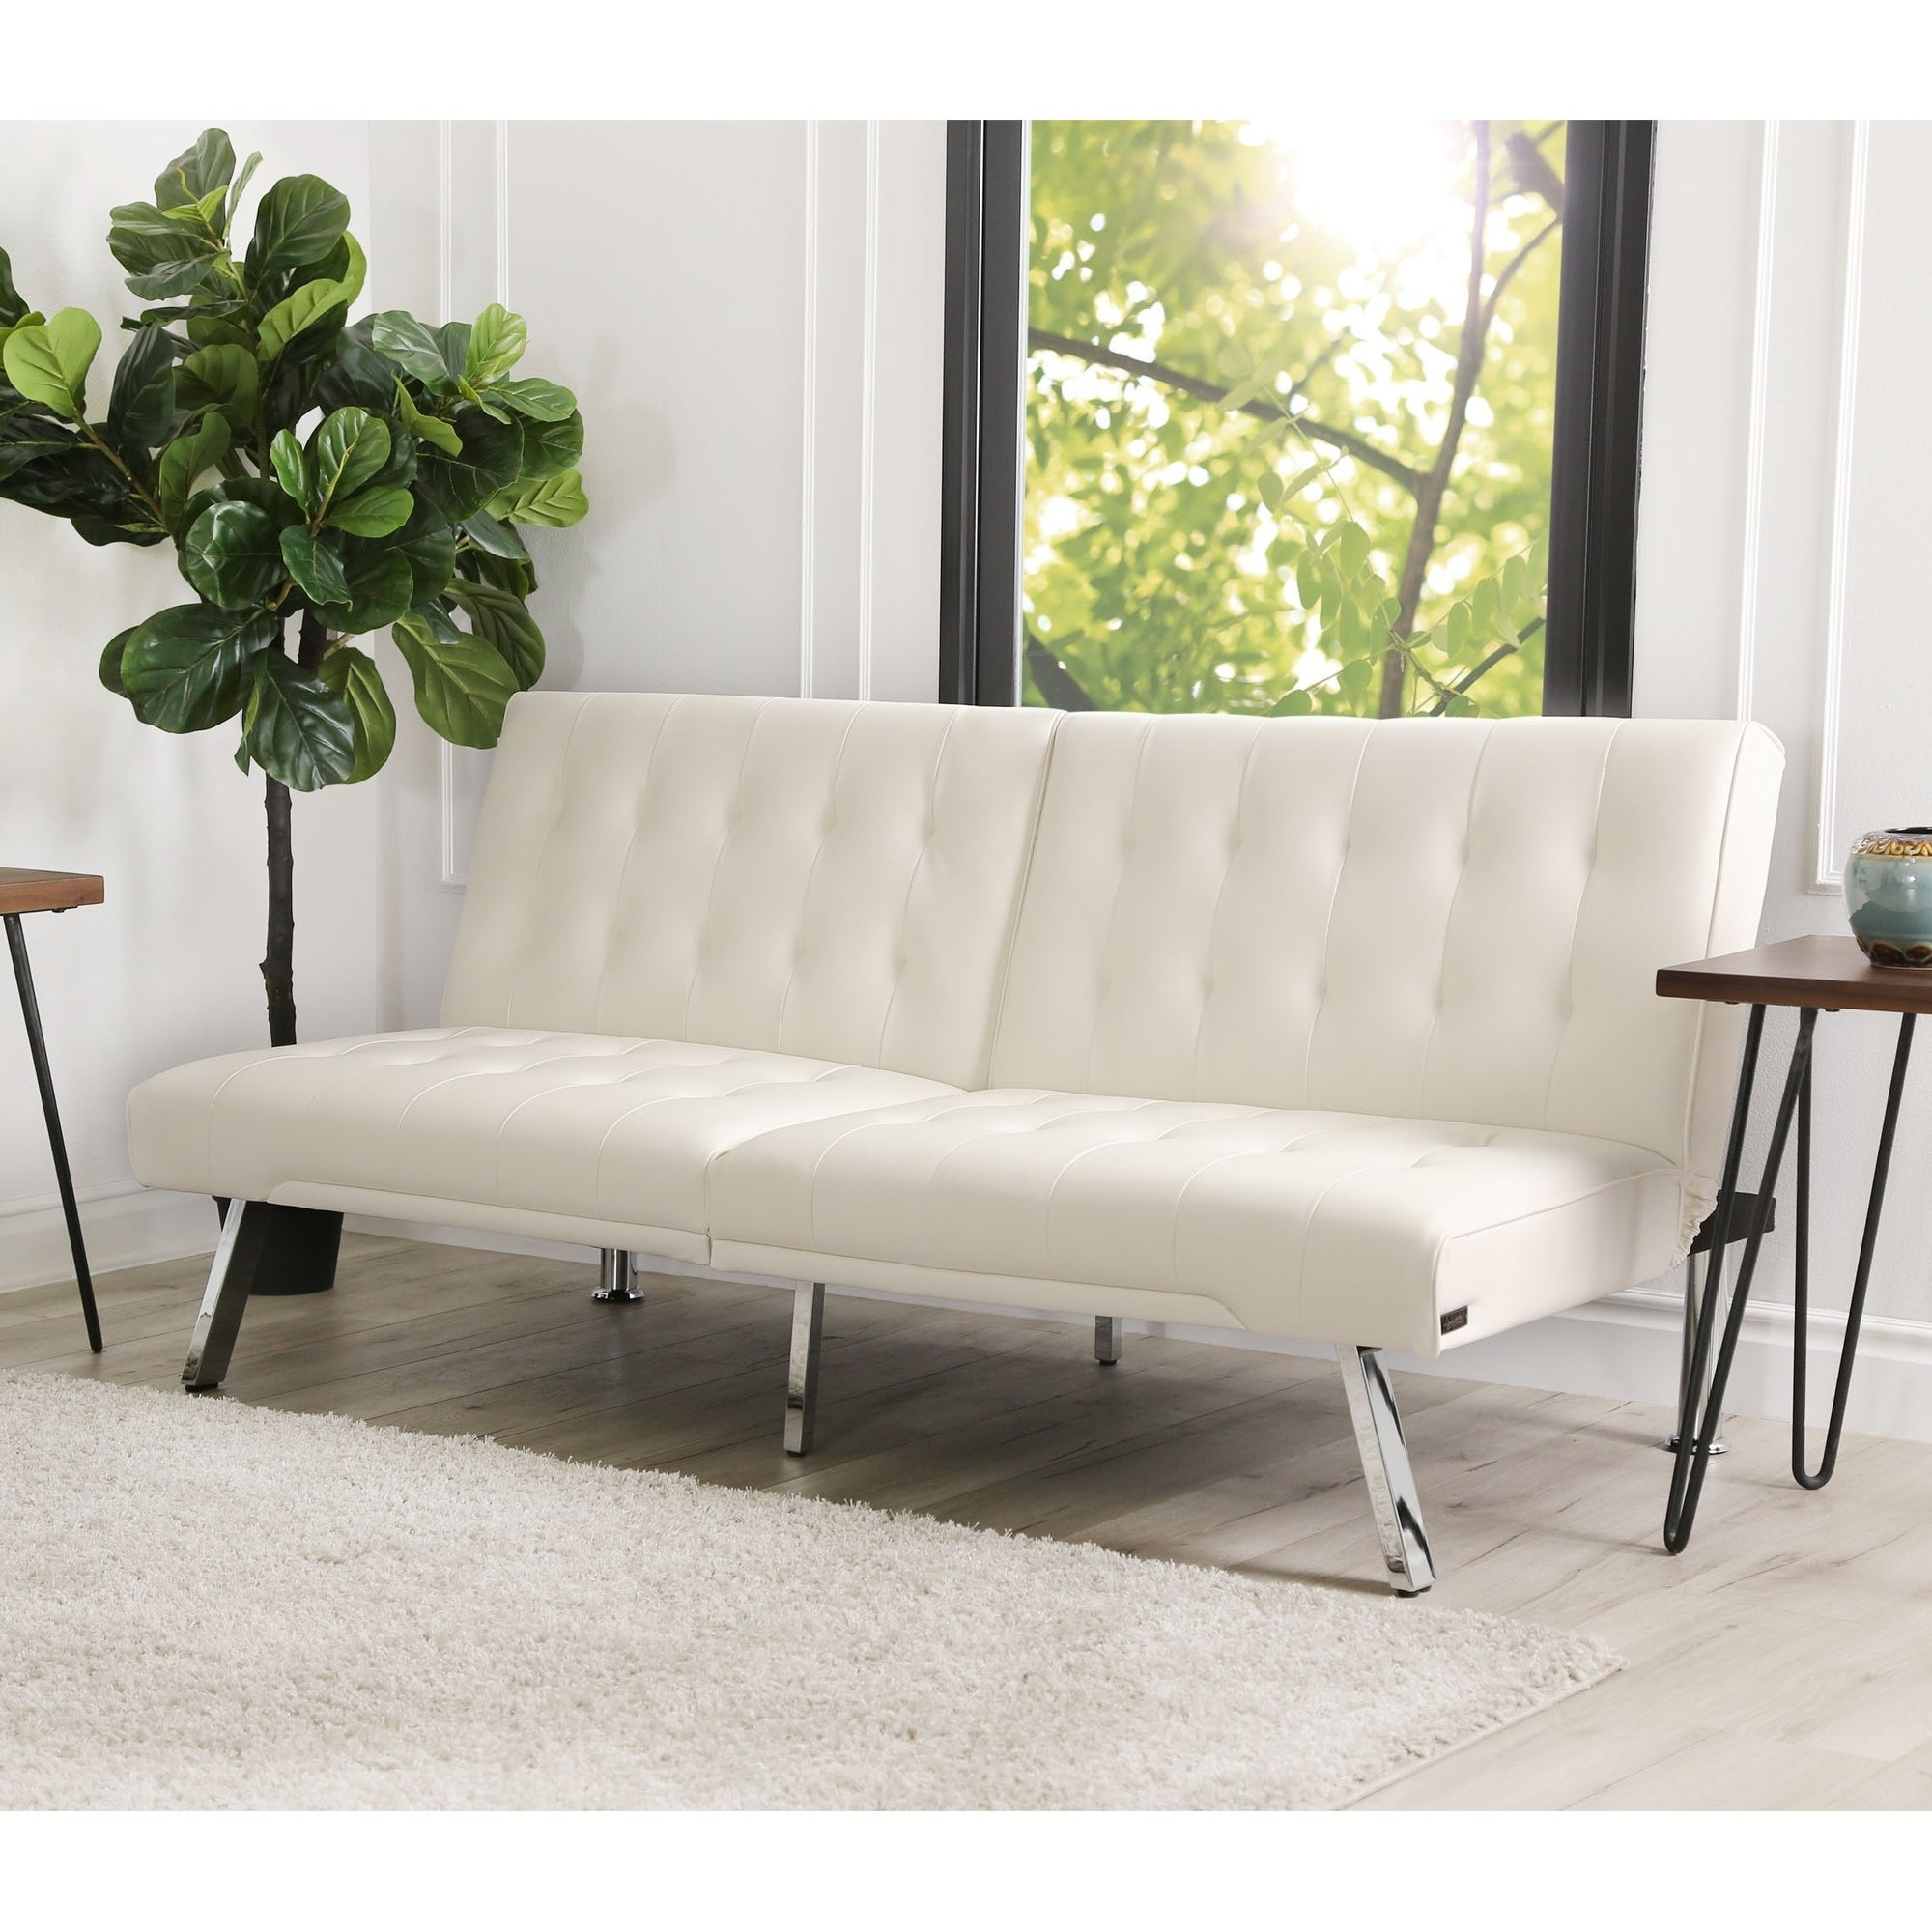 Shop Abbyson Jackson Ivory Leather Foldable Futon Sofa Bed - On Sale ...